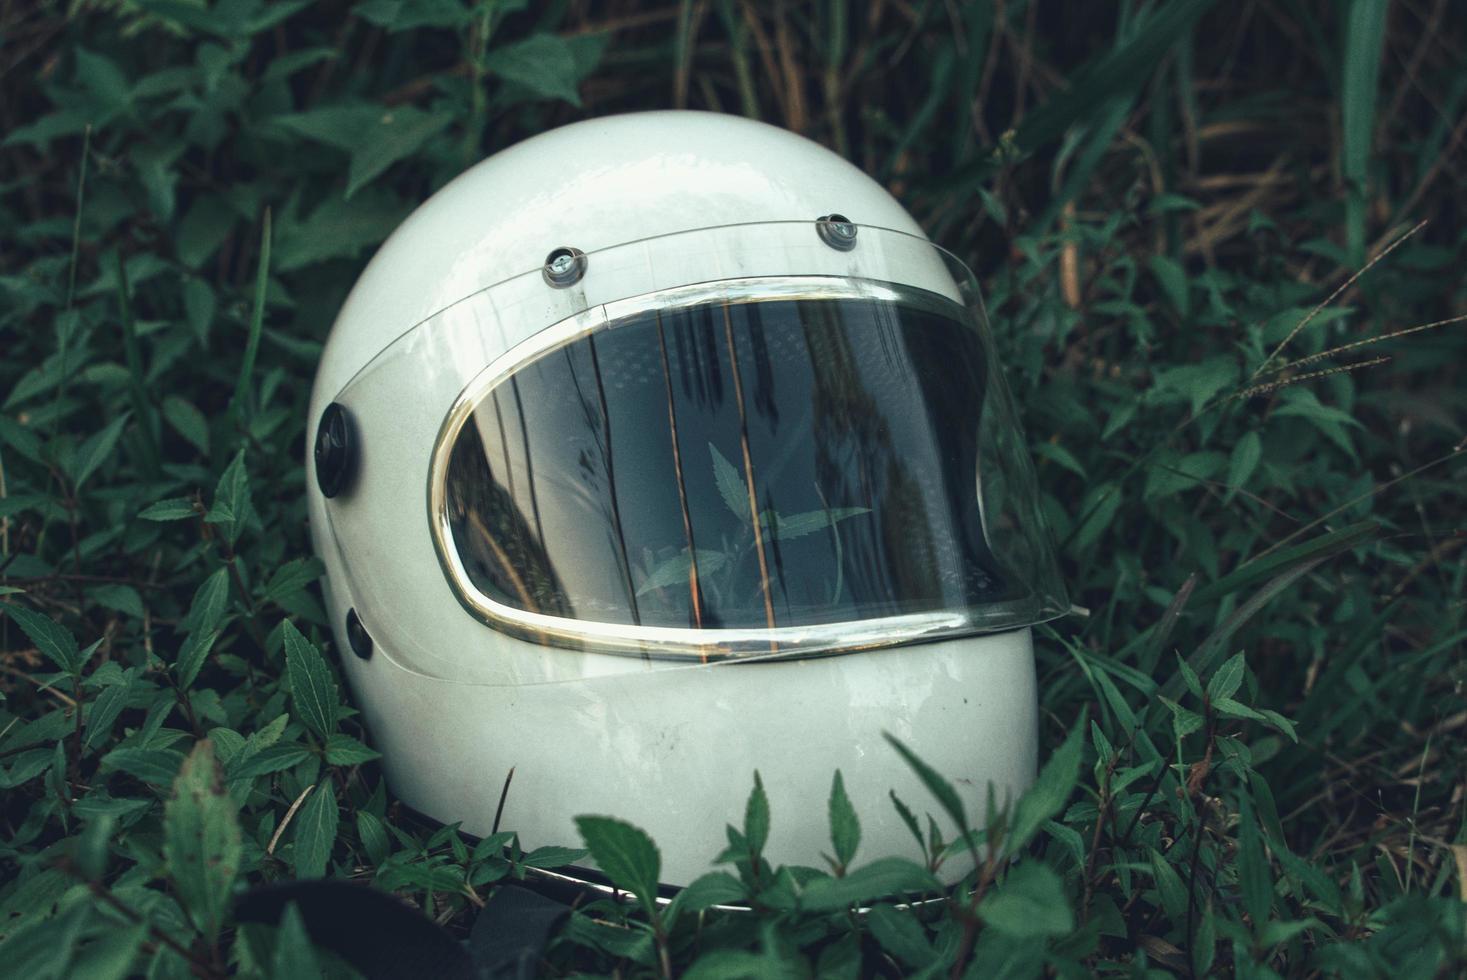 witte helm in gras foto